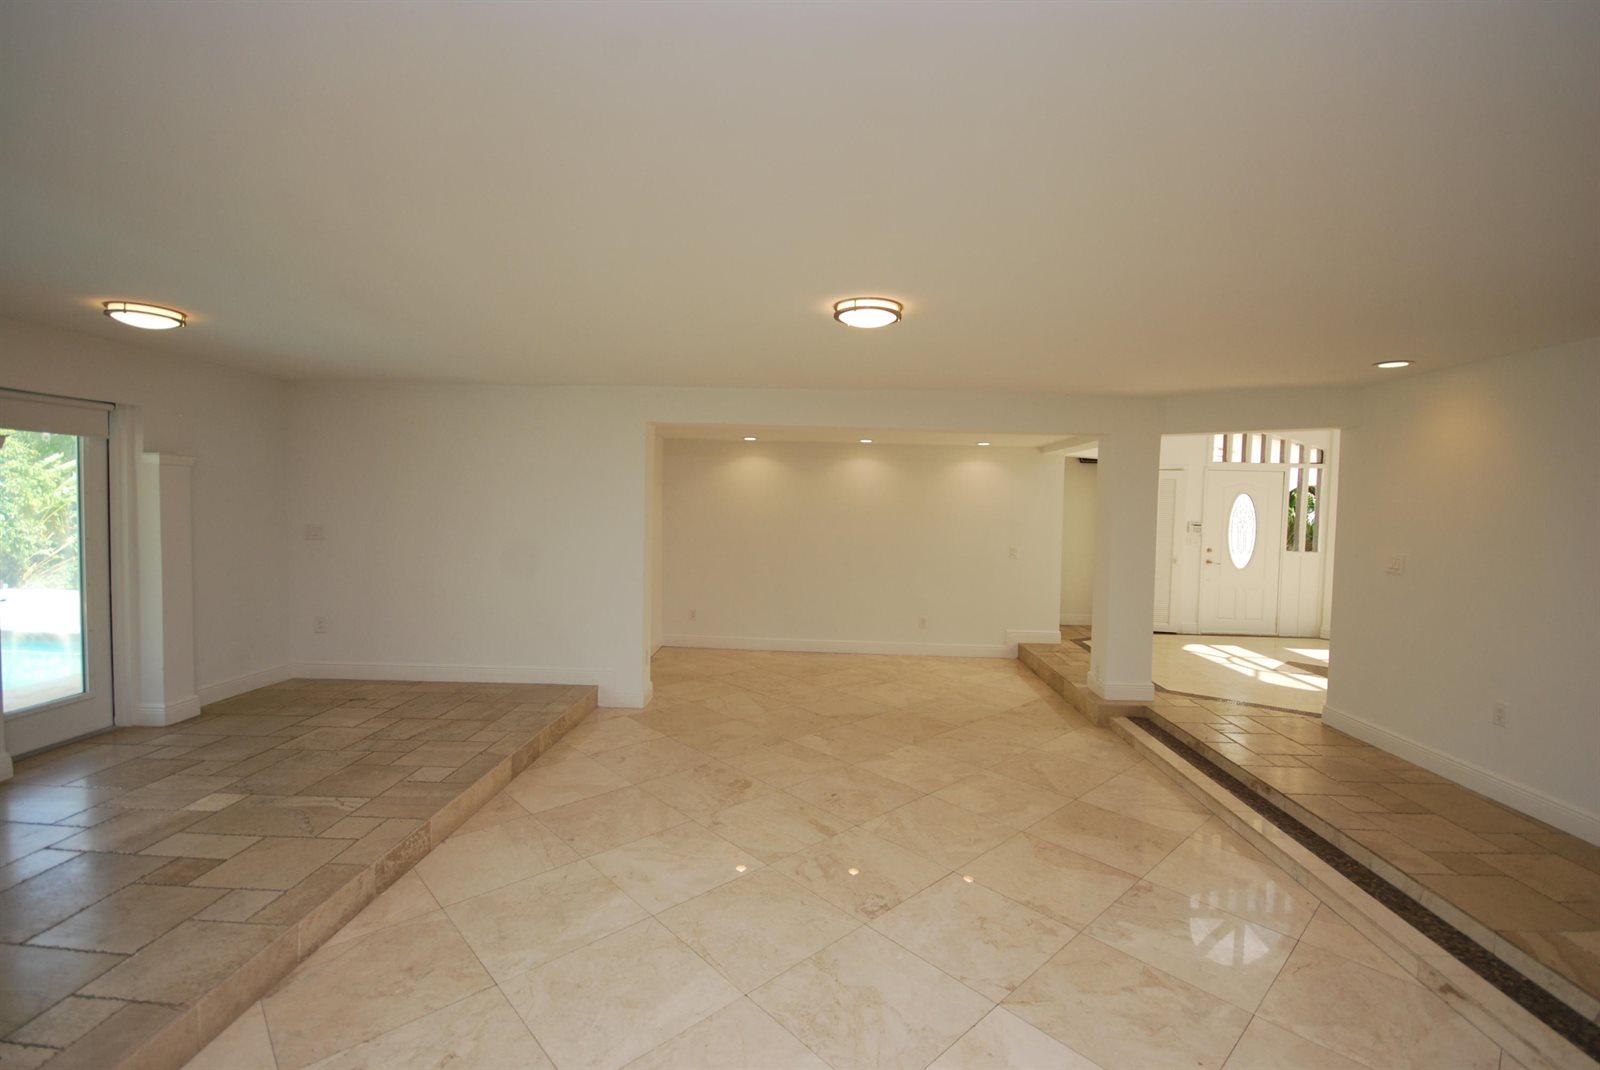 307 NE 23rd Terrace, Fort Lauderdale, FL 33301